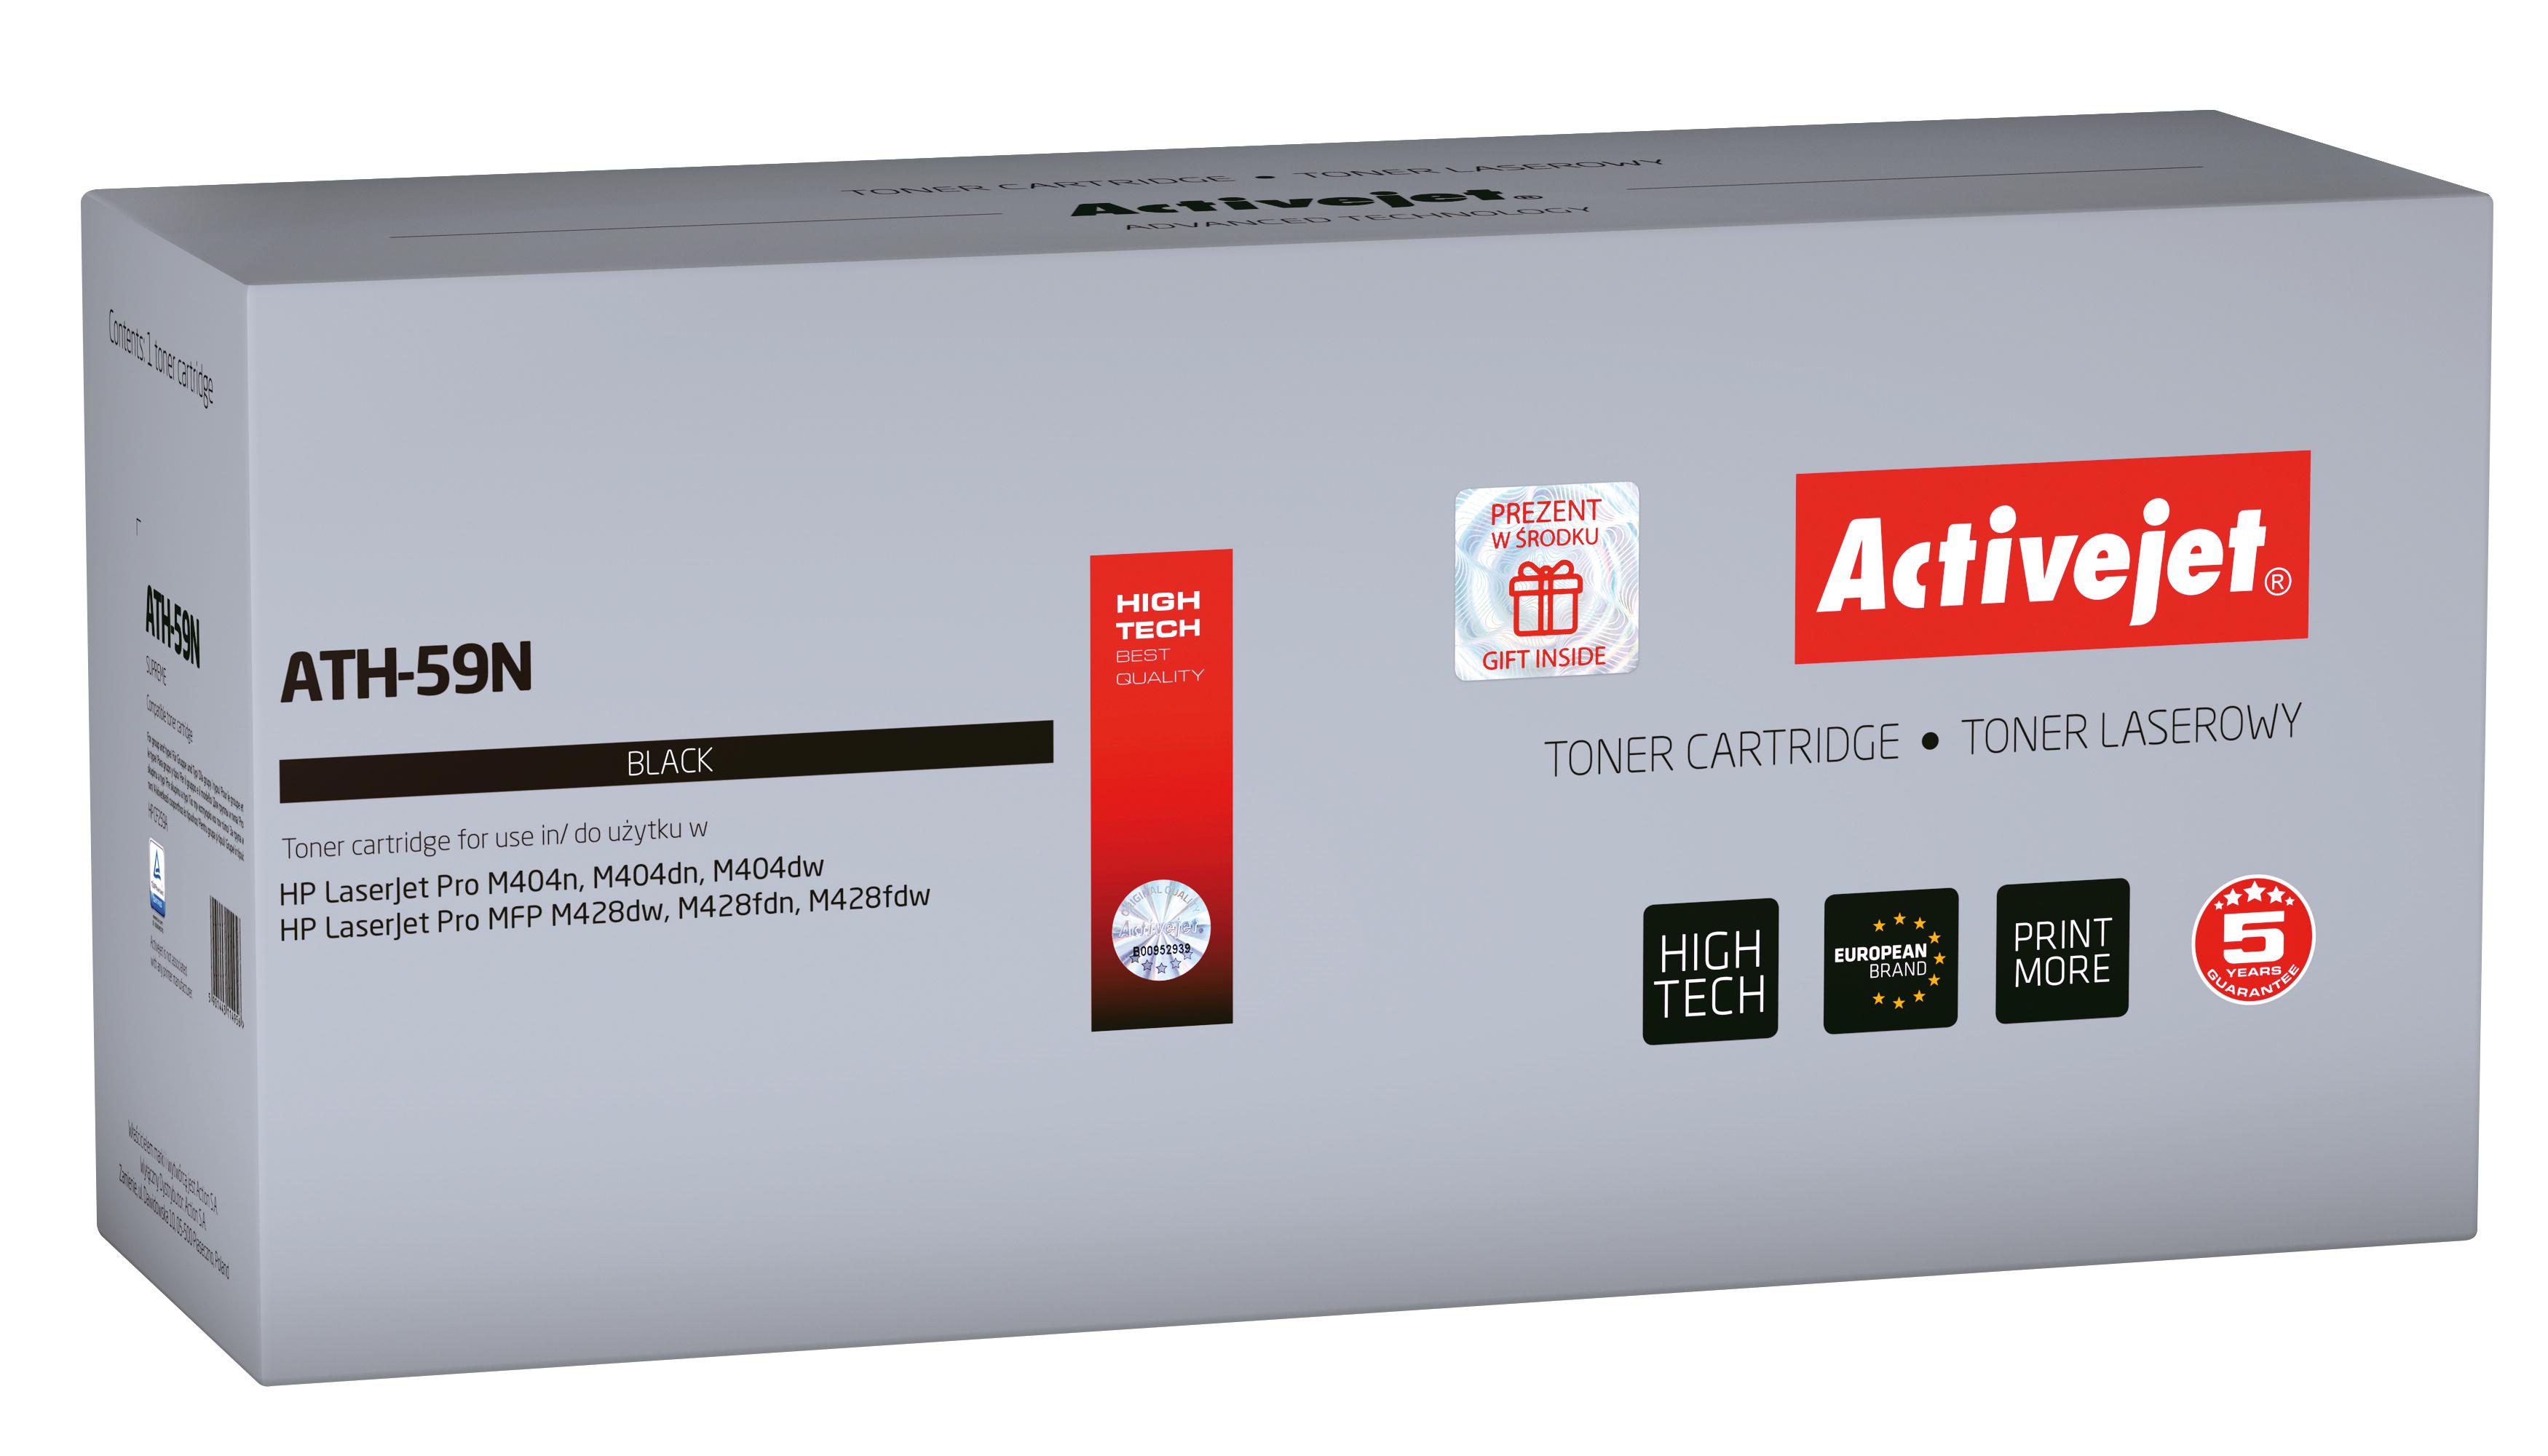 Toner Activejet  ATH-59N do drukarki HP, Zamiennik HP 59A CF259A; Supreme; 3000 stron; Czarny. Brak chipa